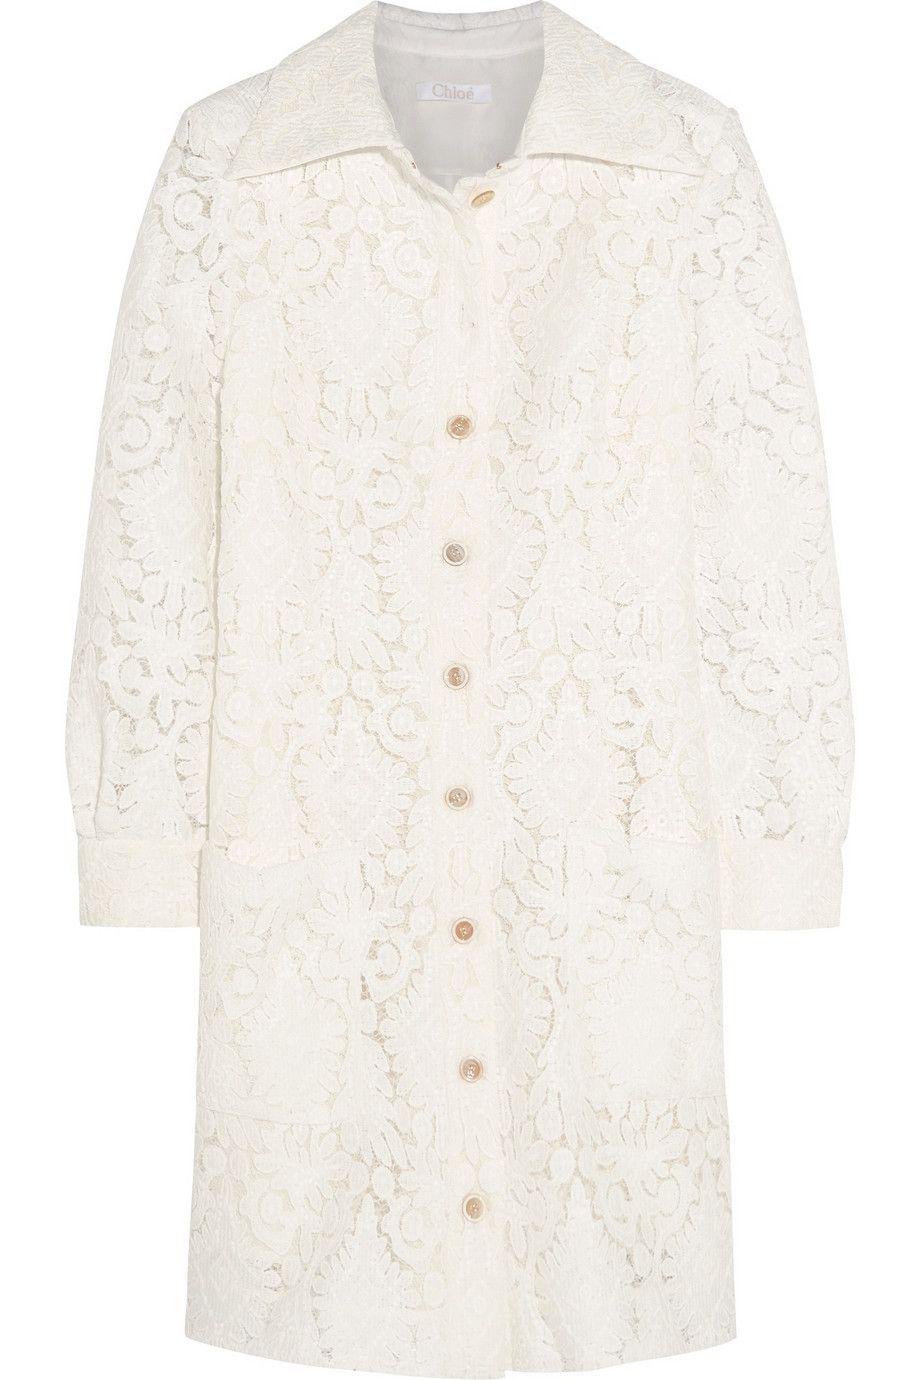 "Chloé Lace Mini Dress, $4,350&#x3B; <a href=""http://www.net-a-porter.com/us/en/product/544804"">net-a-porter.com</a> <!--EndFragment-->"